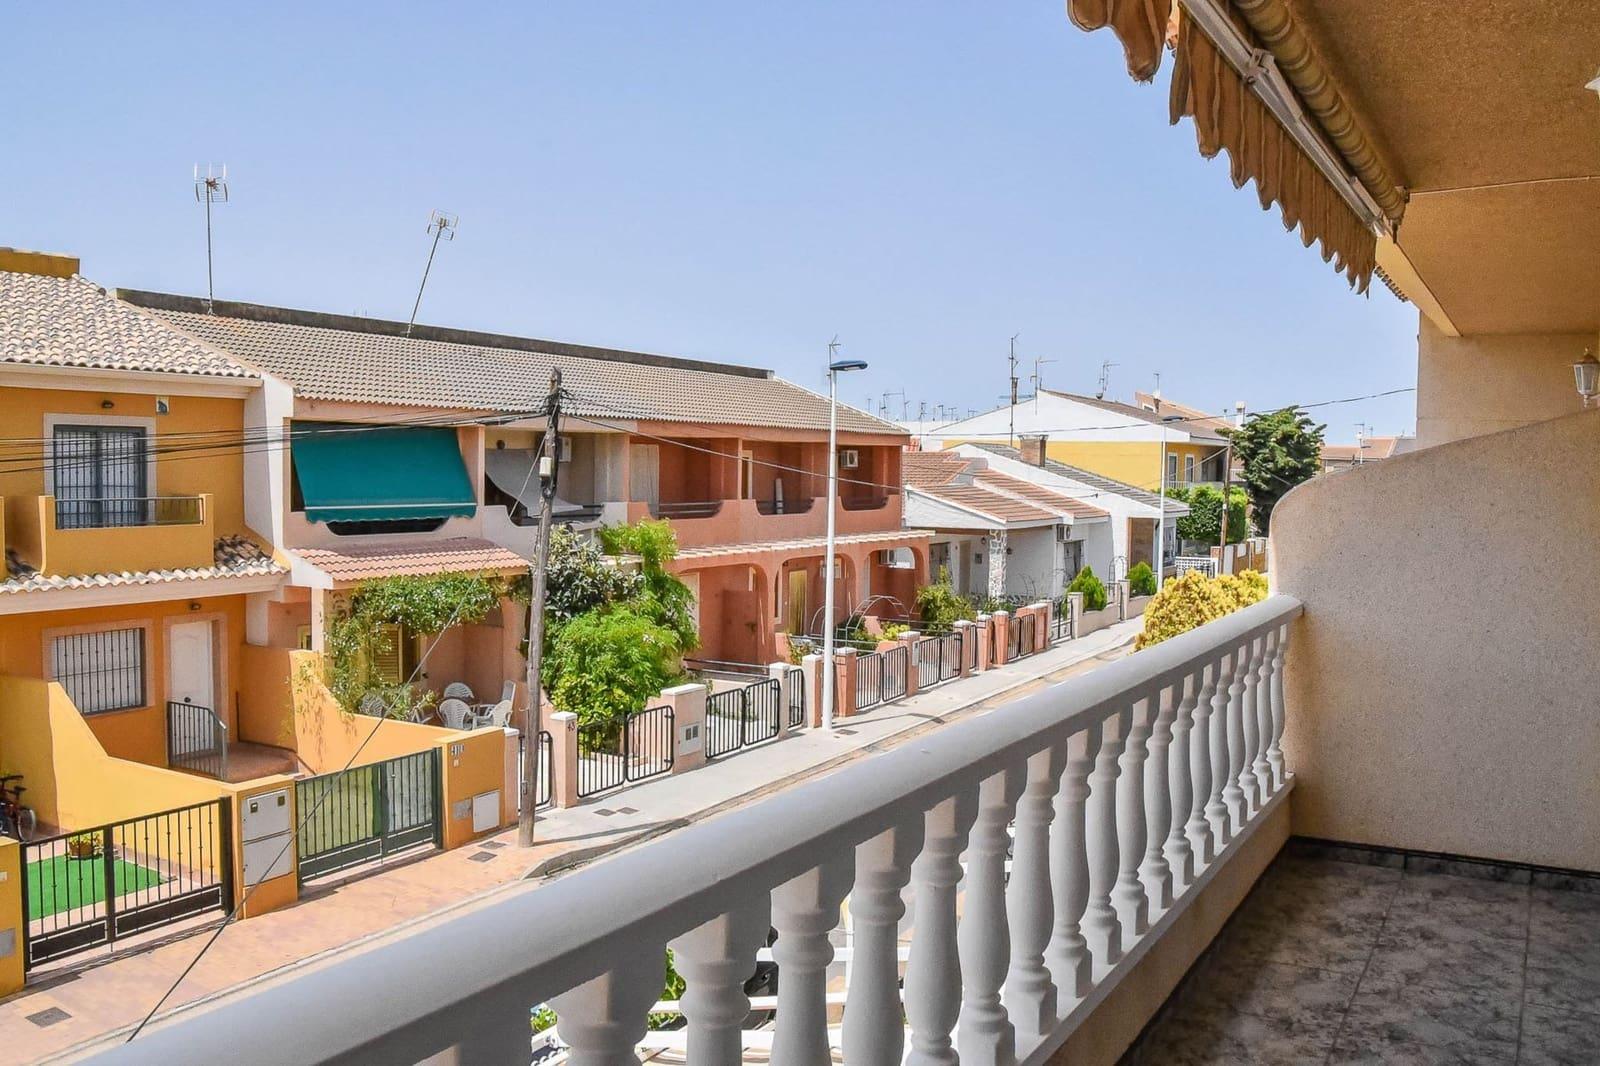 4 bedroom Townhouse for sale in San Pedro del Pinatar - € 172,000 (Ref: 4946926)